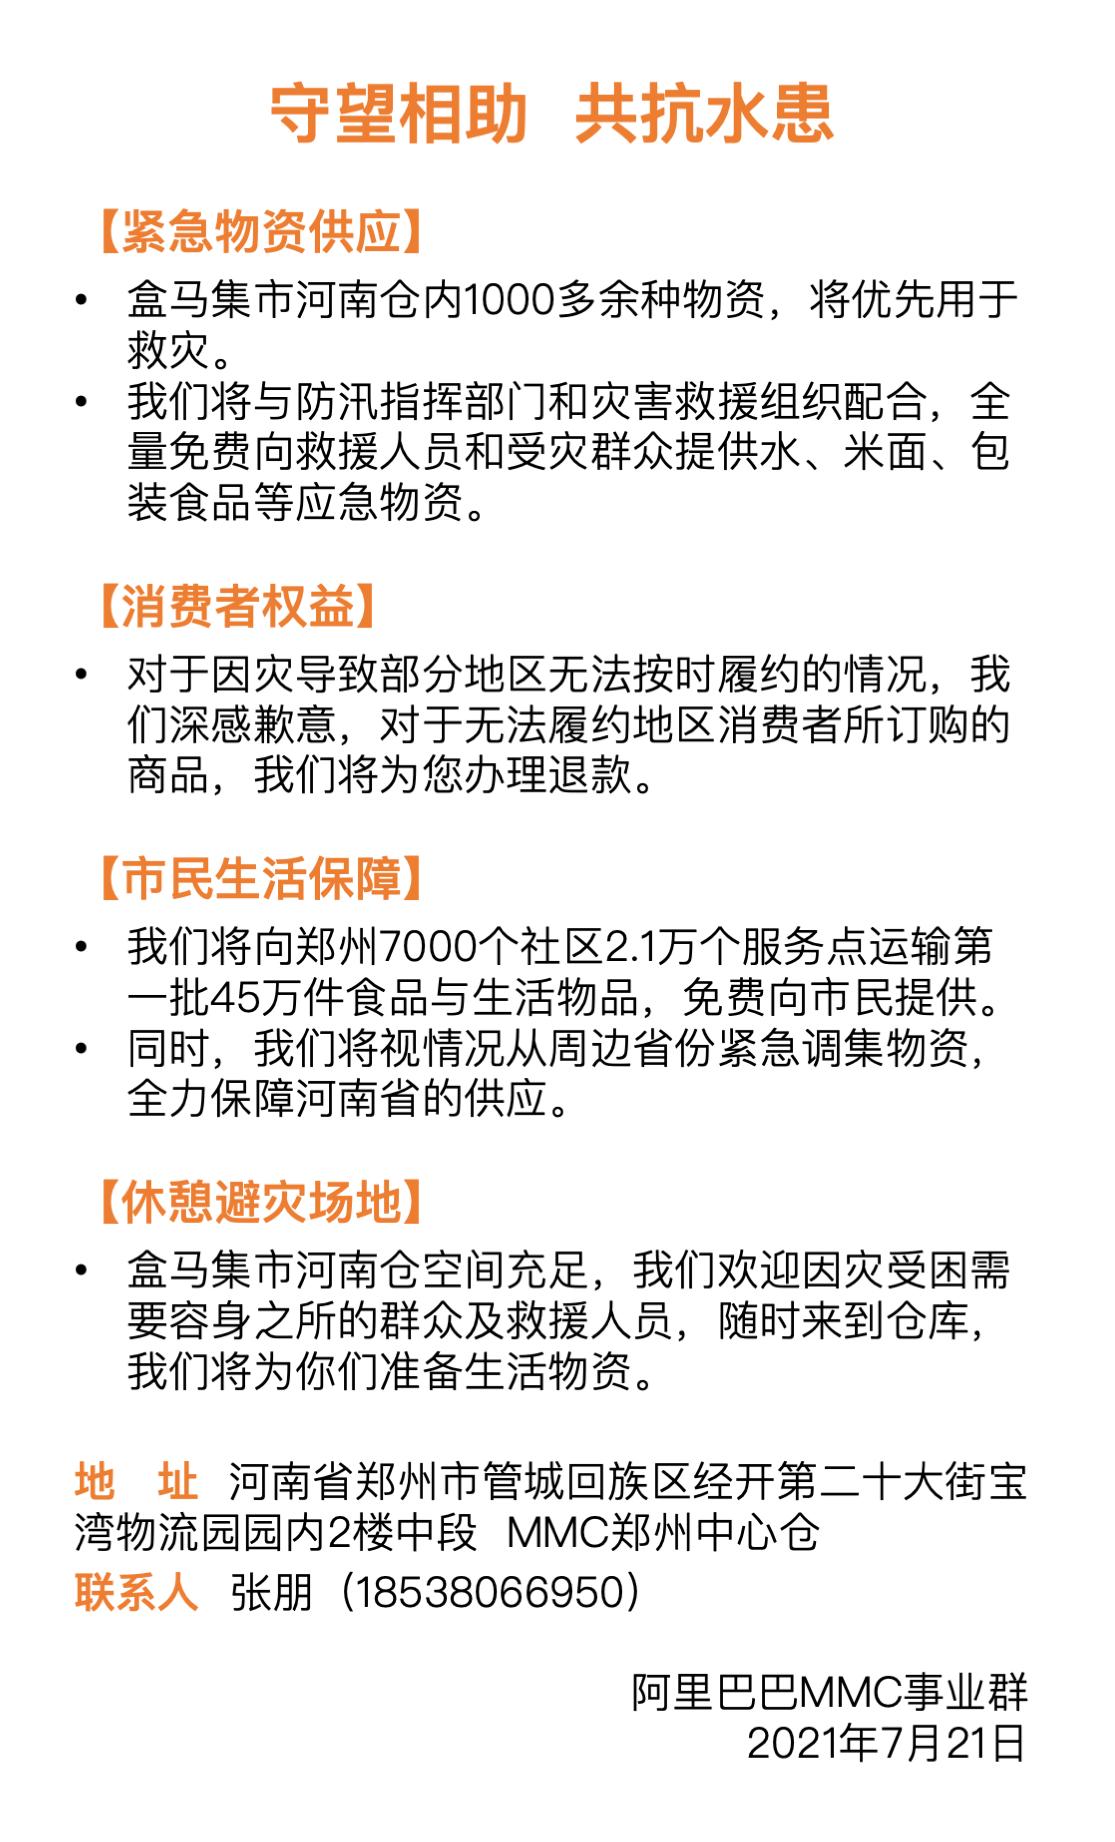 MMC河南开仓抗灾 将免费向郑州7000个社区提供首批45万件生活用品